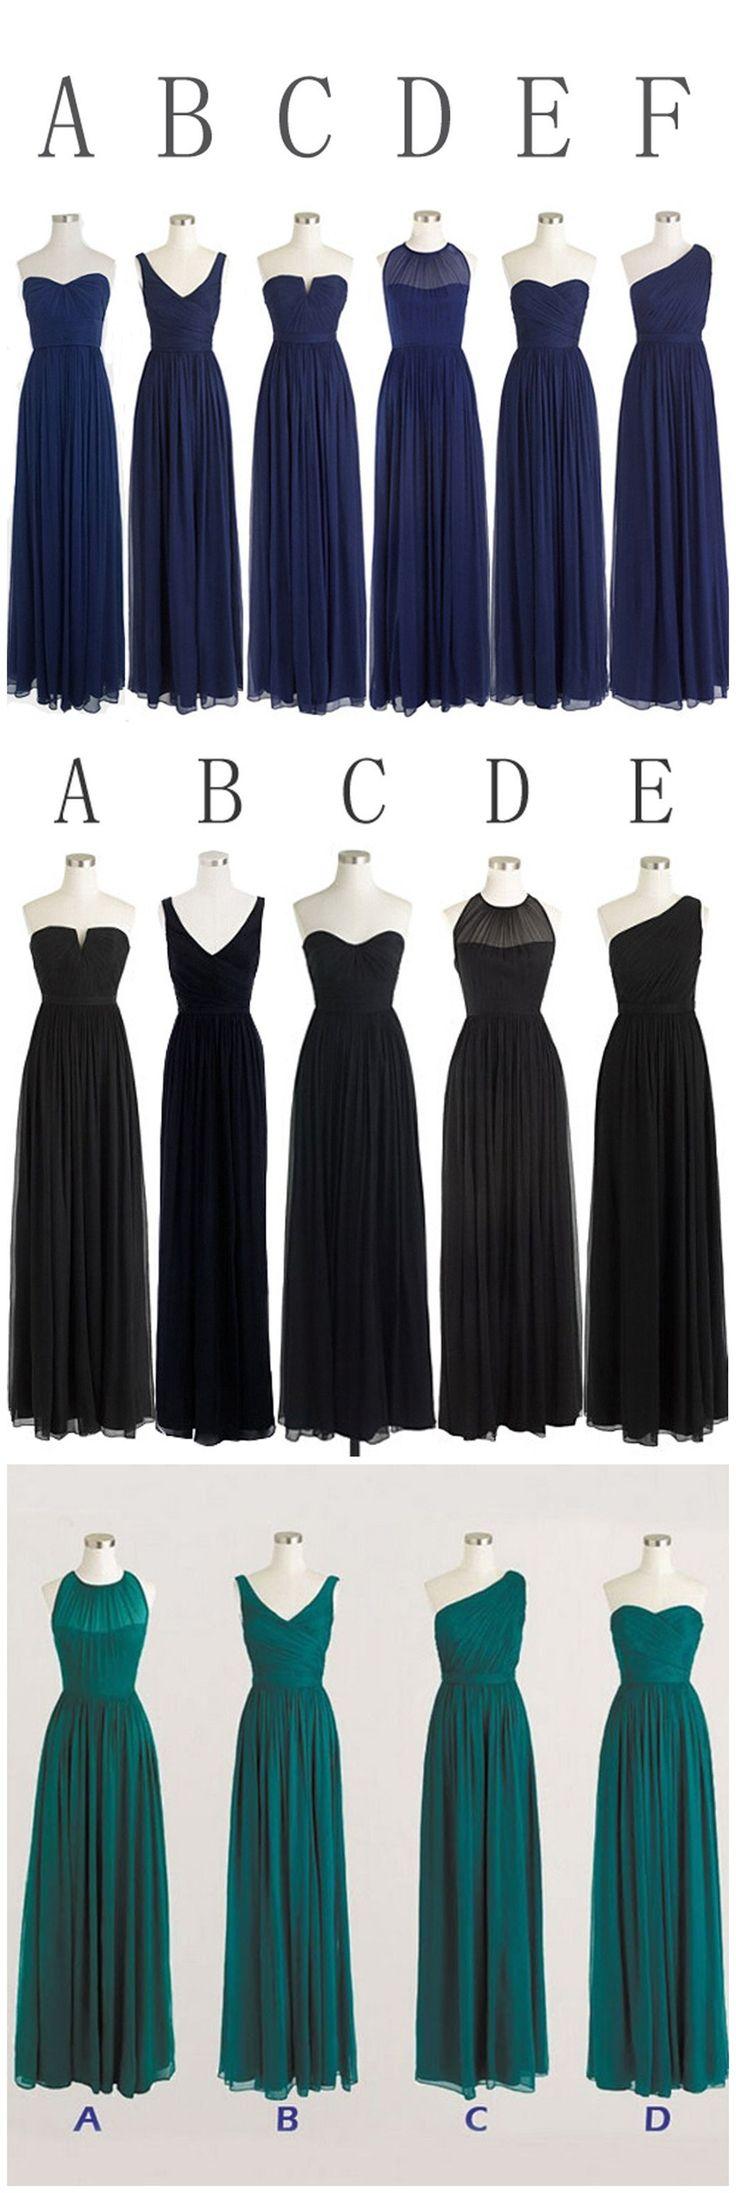 Classic Popular Navy Blue Mismatched Chiffon Formal Cheap Long Bridesmaid Dresses, WG302